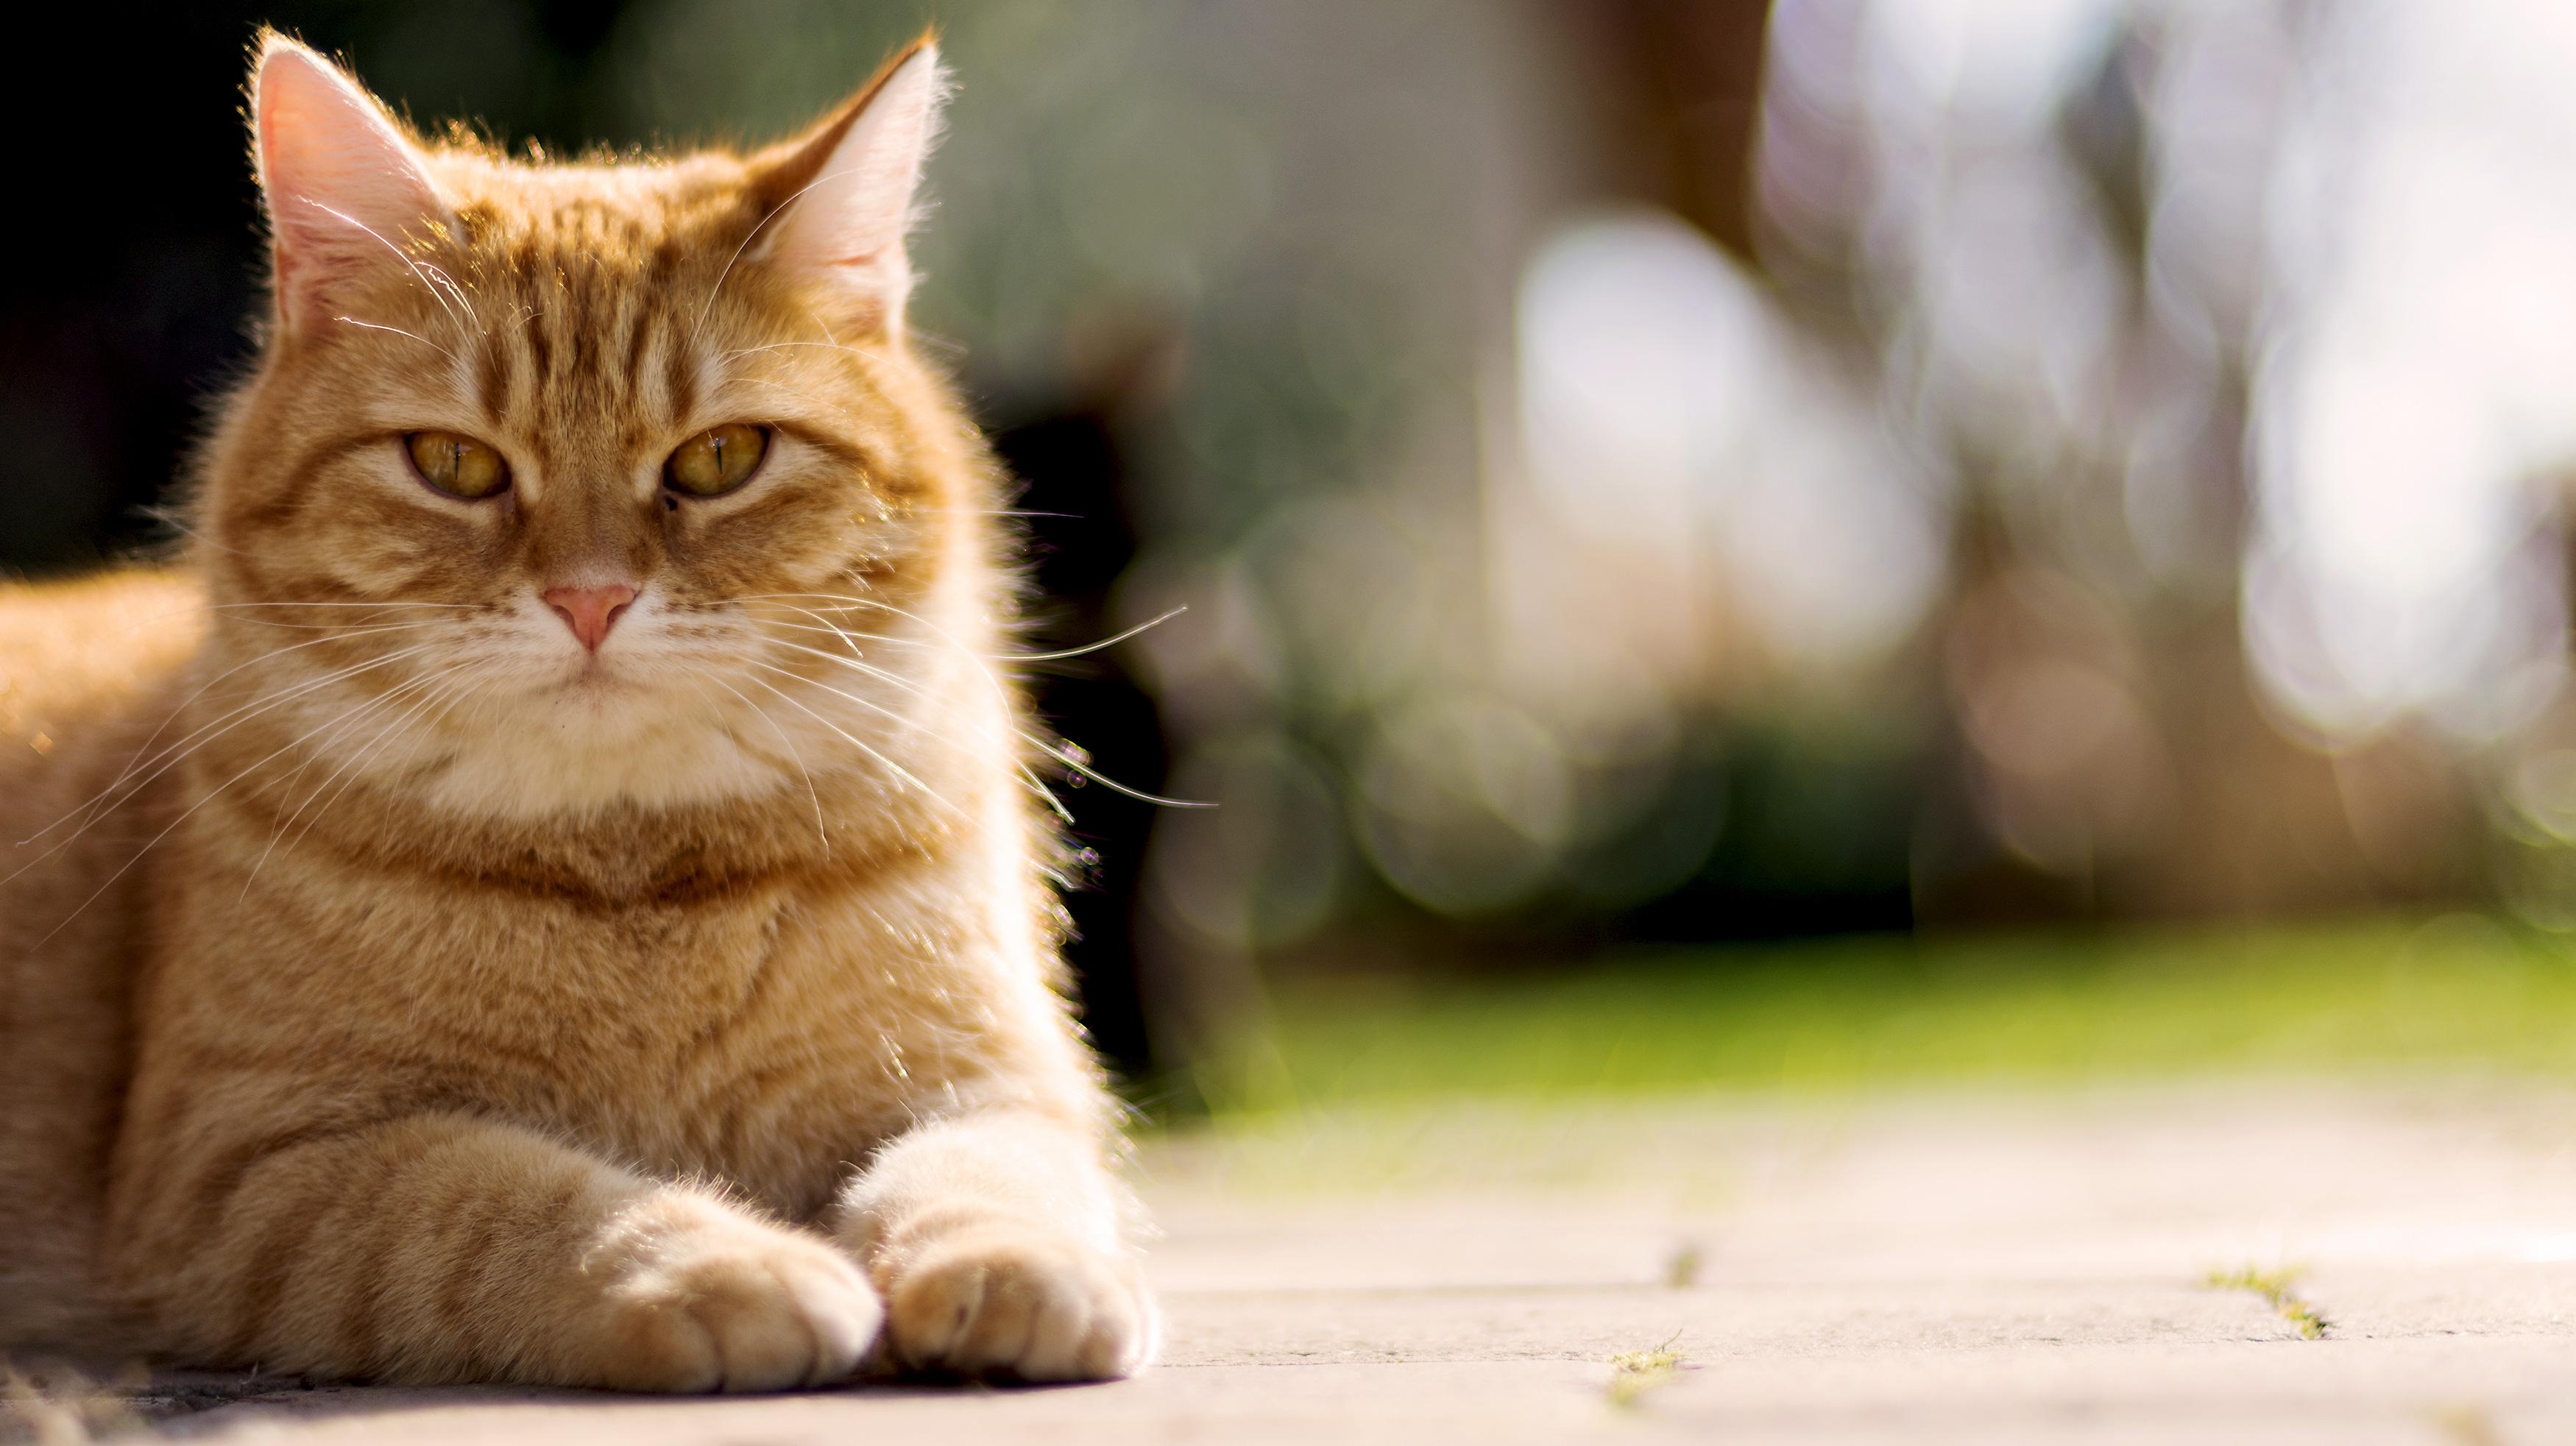 Portrait Of Lying Cat Free Stock Photo Libreshot